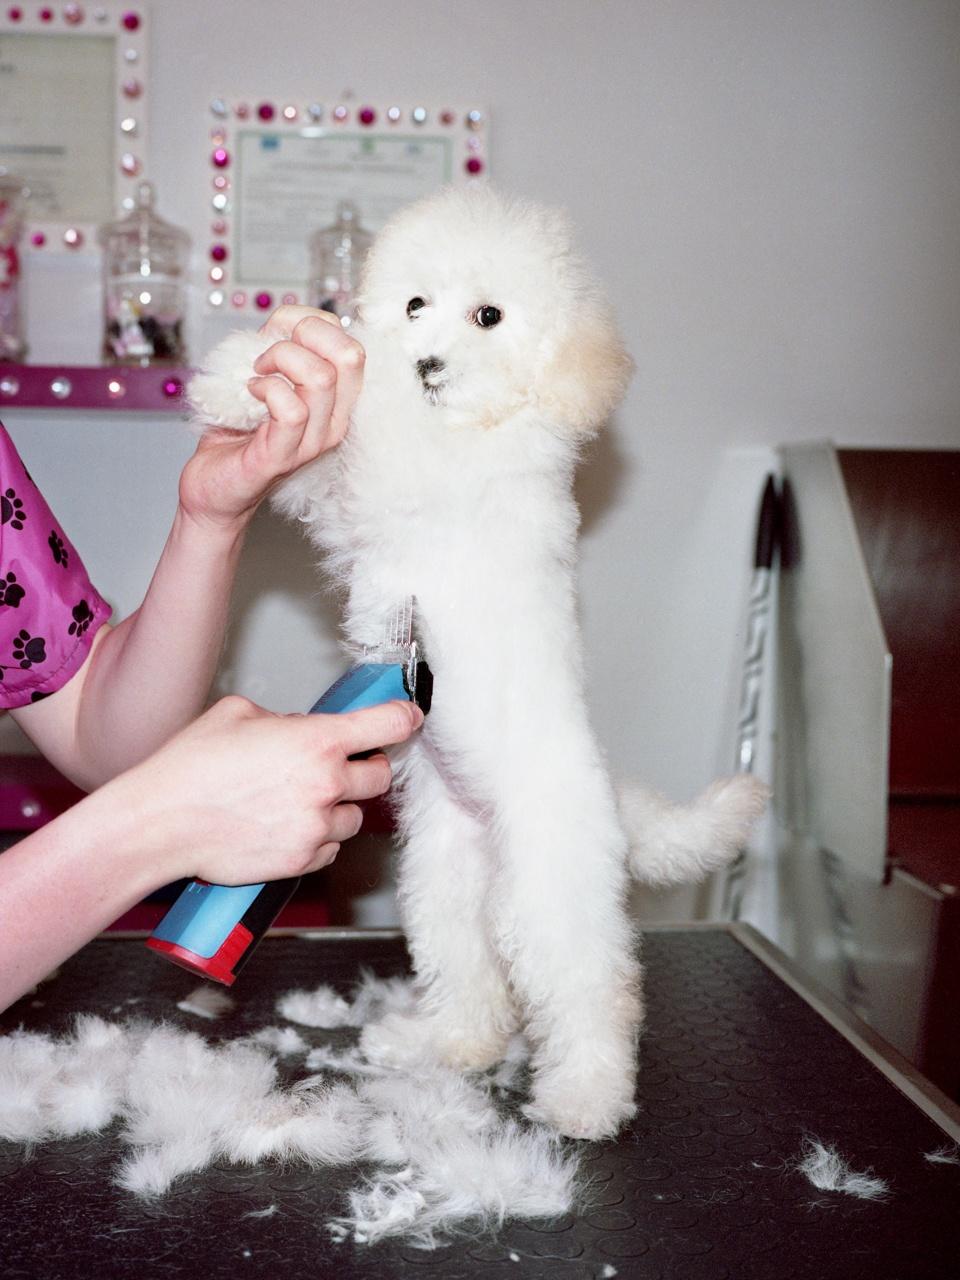 Dog beauty center in Milan